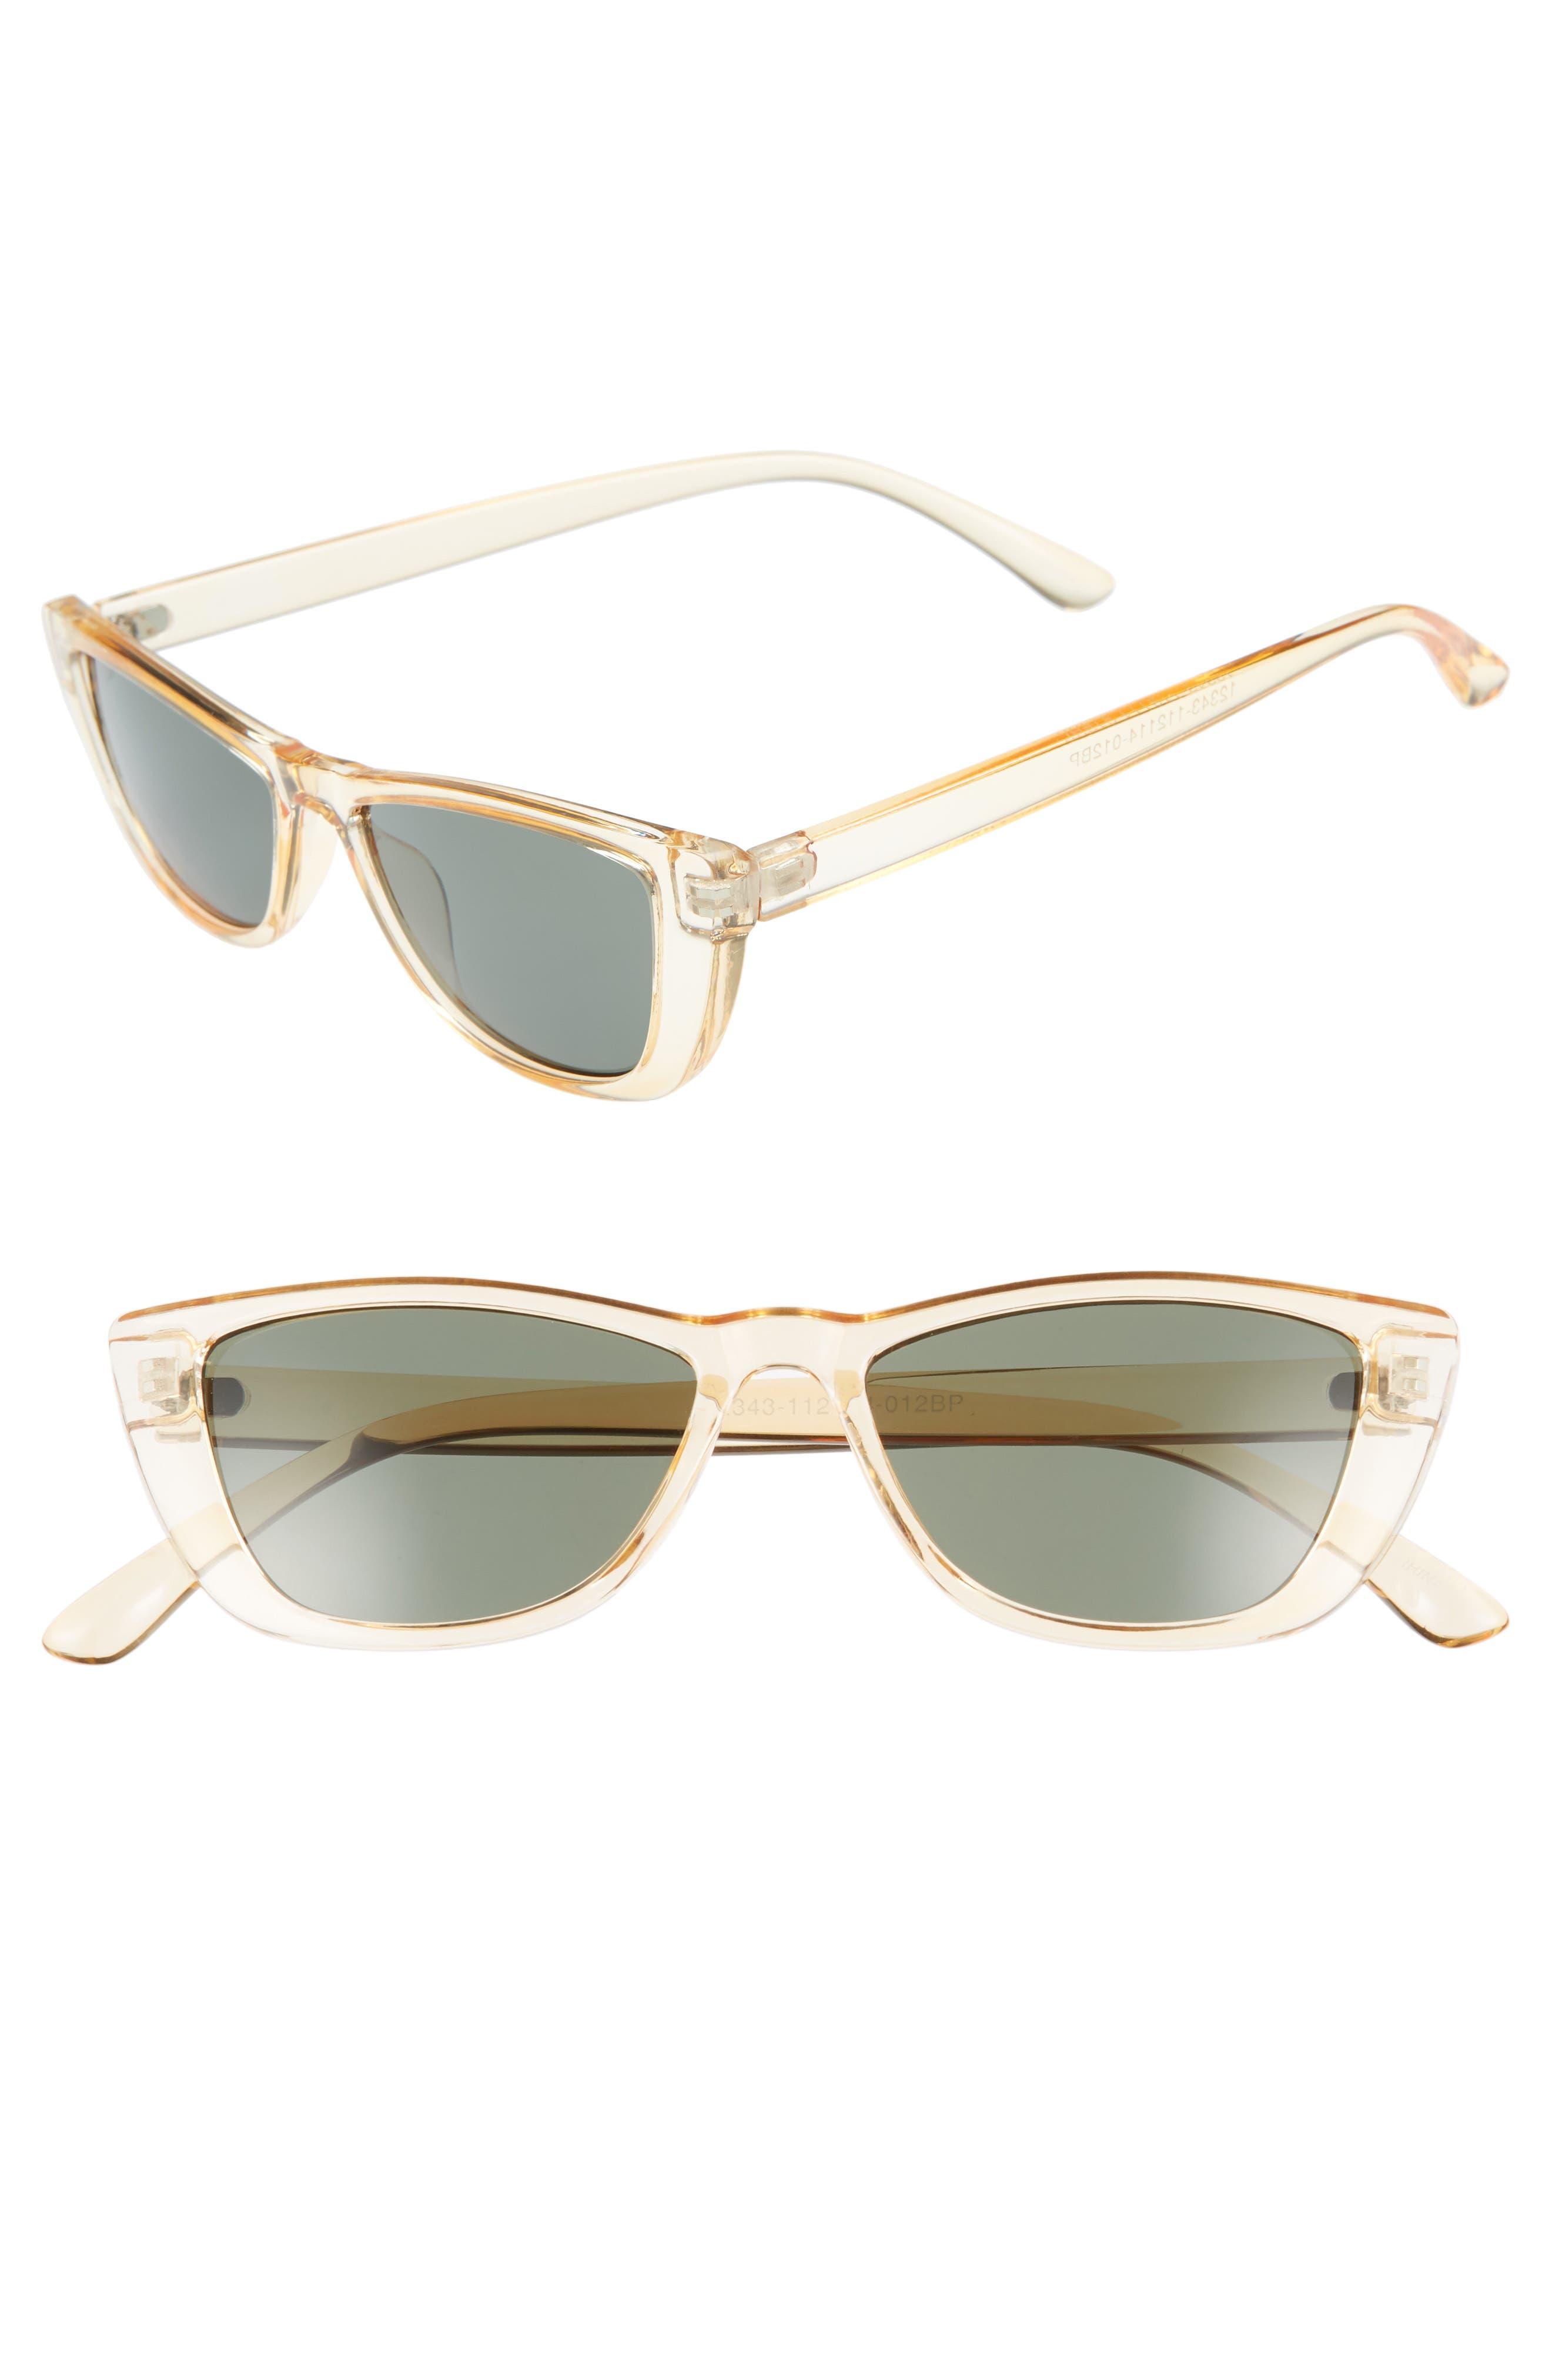 49mm Flat Top Rectangular Sunglasses,                             Main thumbnail 1, color,                             700